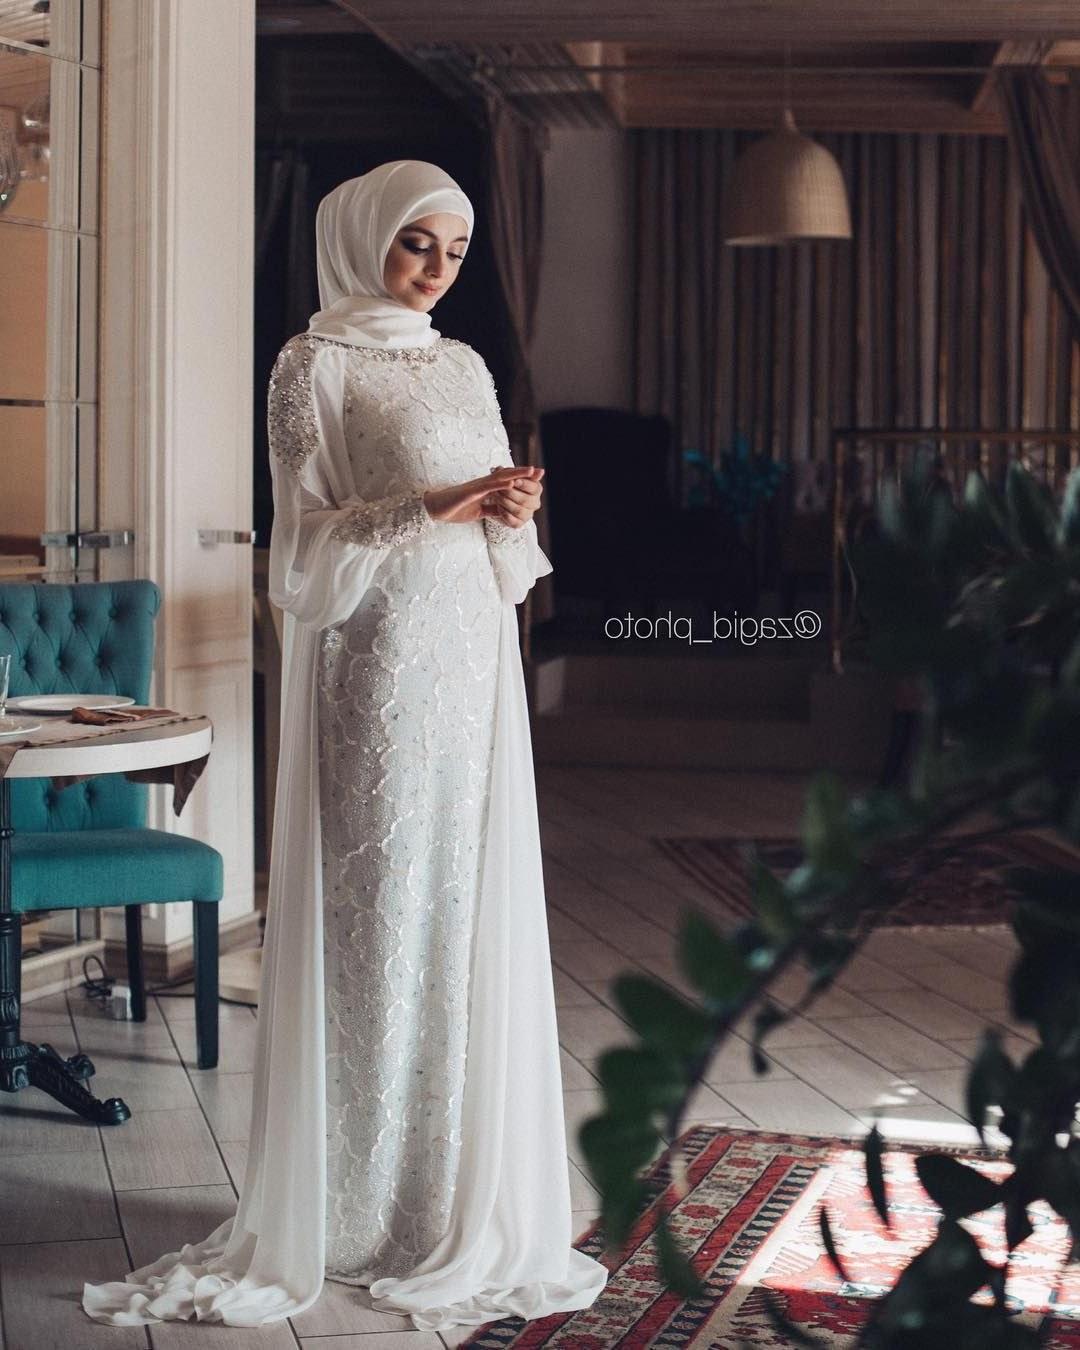 Ide Model Baju Pengiring Pengantin Muslim 87dx 191 Best Muslim Wedding Images